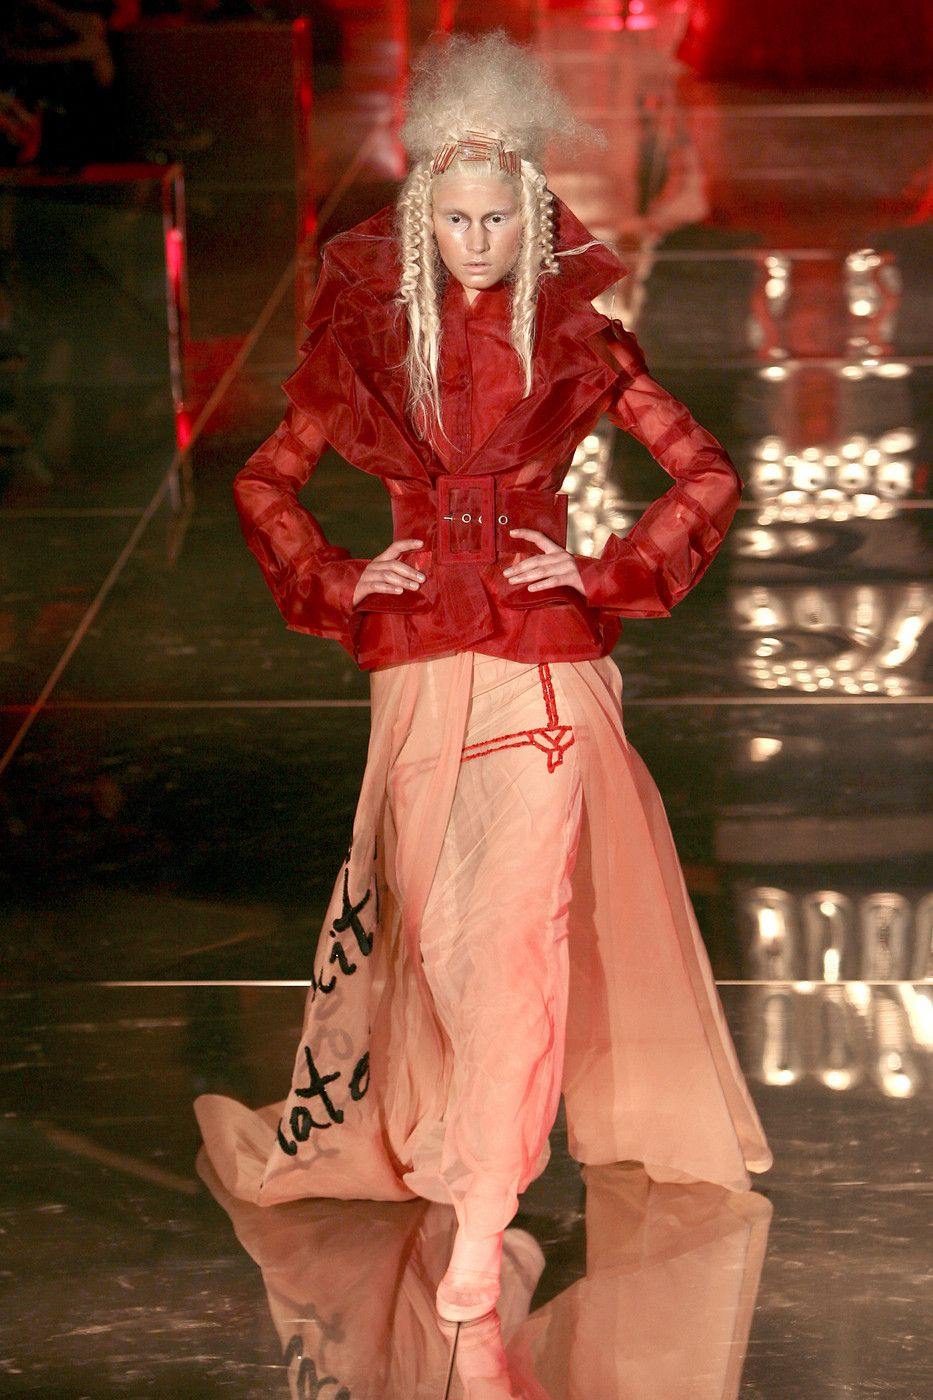 John Galliano for Christian Dior Spring Summer 2006 Haute Couture